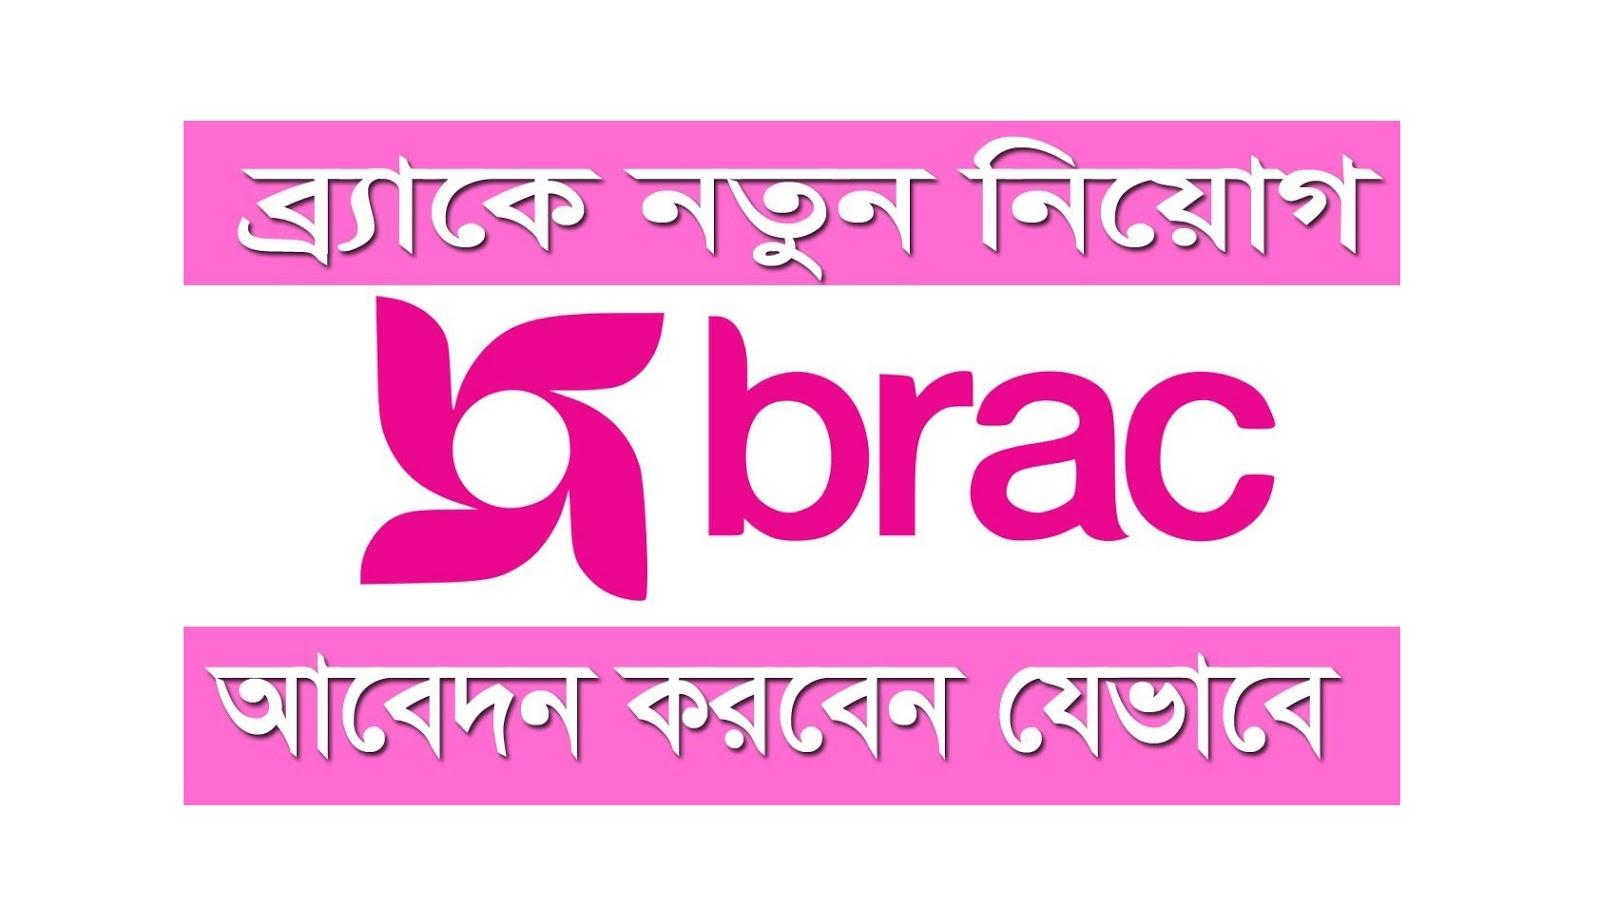 BRAC Bank Limited Job Circular || ব্রাকে আবারো নতুন চাকরির নিয়োগ বিজ্ঞপ্তি প্রকাশ